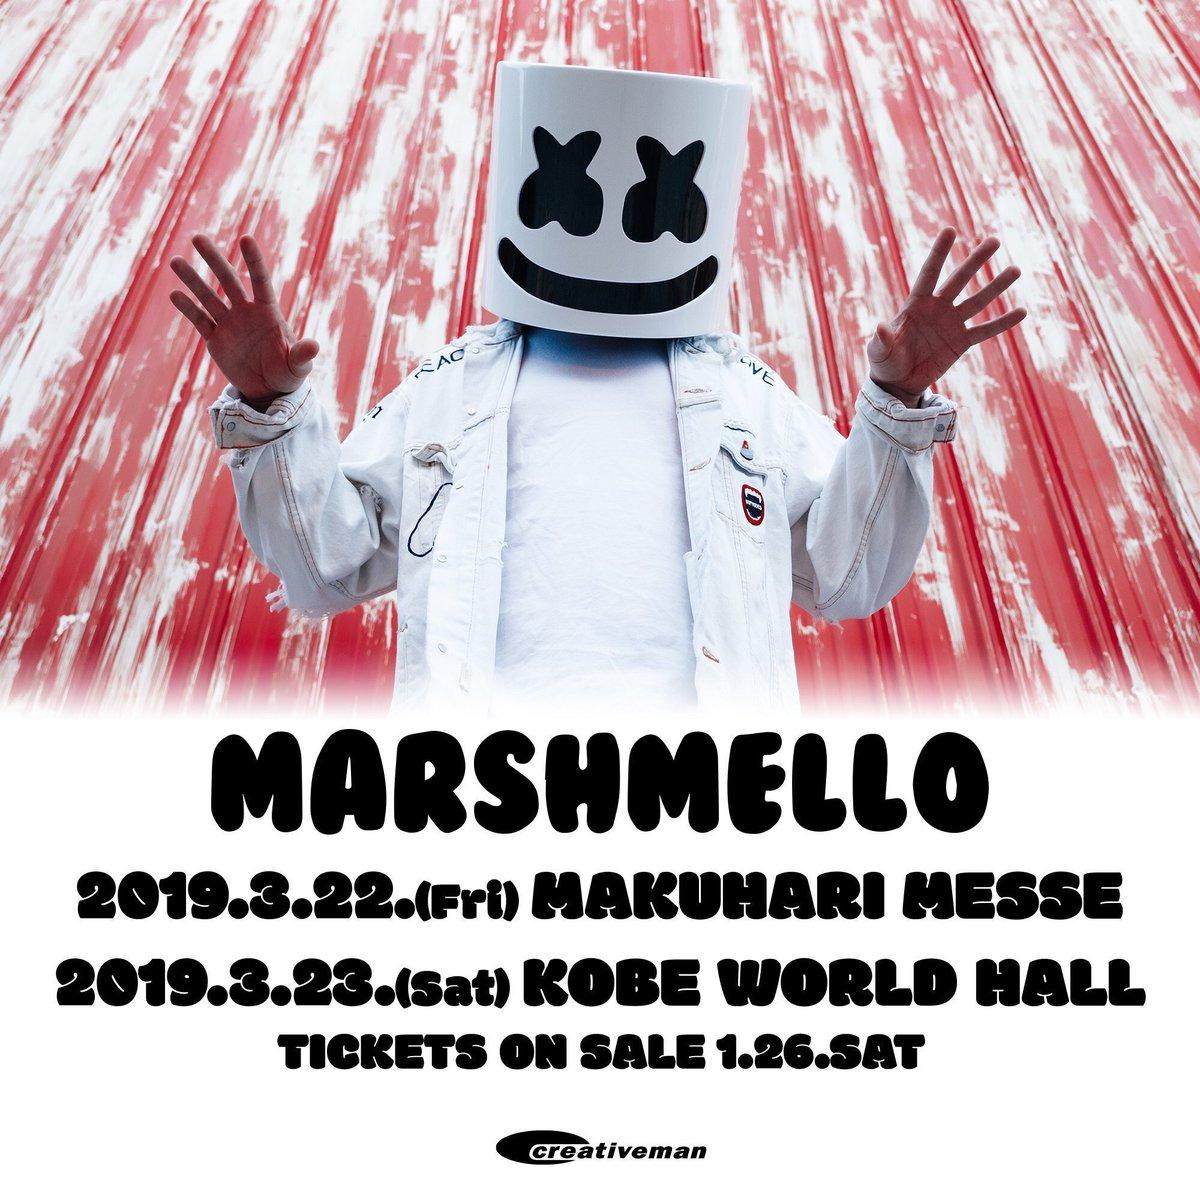 Dj壁紙 On Twitter Marshmello来日公演ーー